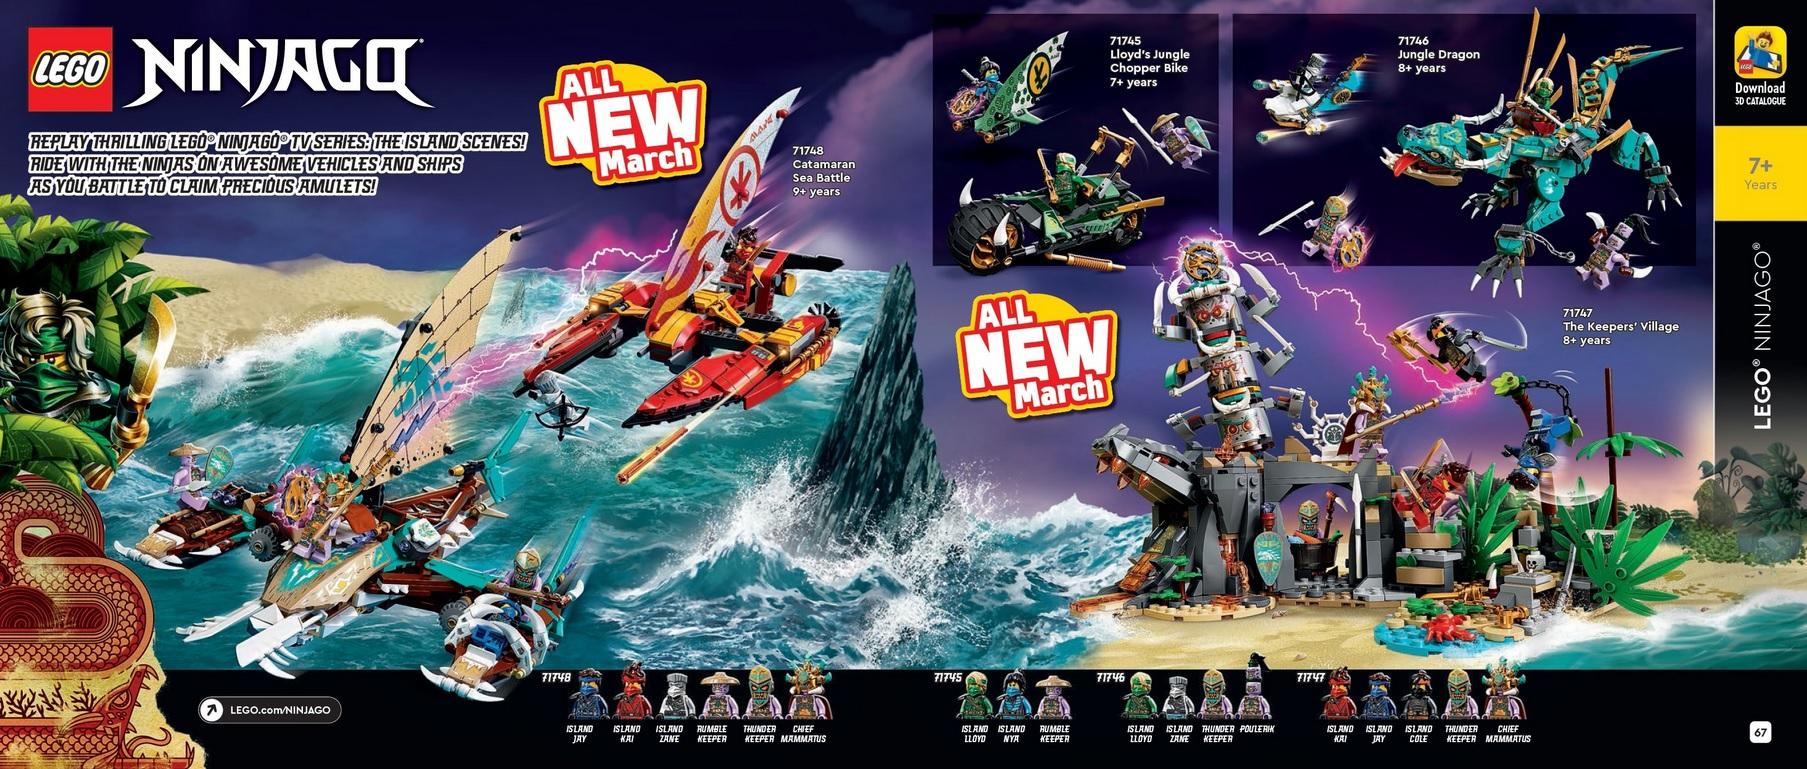 Lego Calendar May 2021 New LEGO 2021 Sets Revealed in LEGO Catalog – The Brick Fan